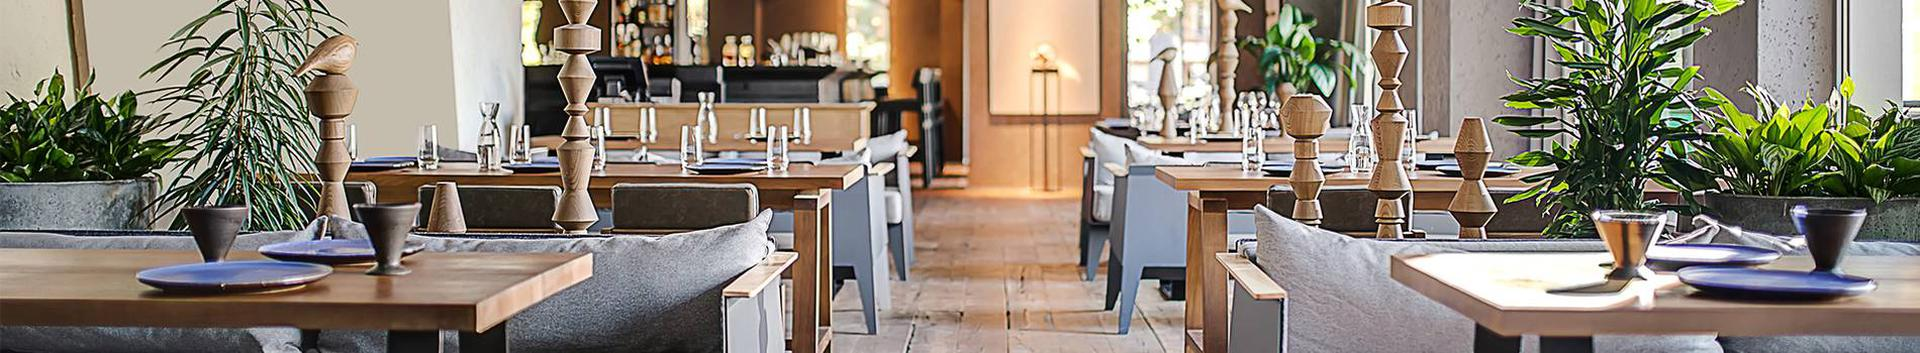 56101_toitlustus-restoran-jm-_12680286_xl.jpg